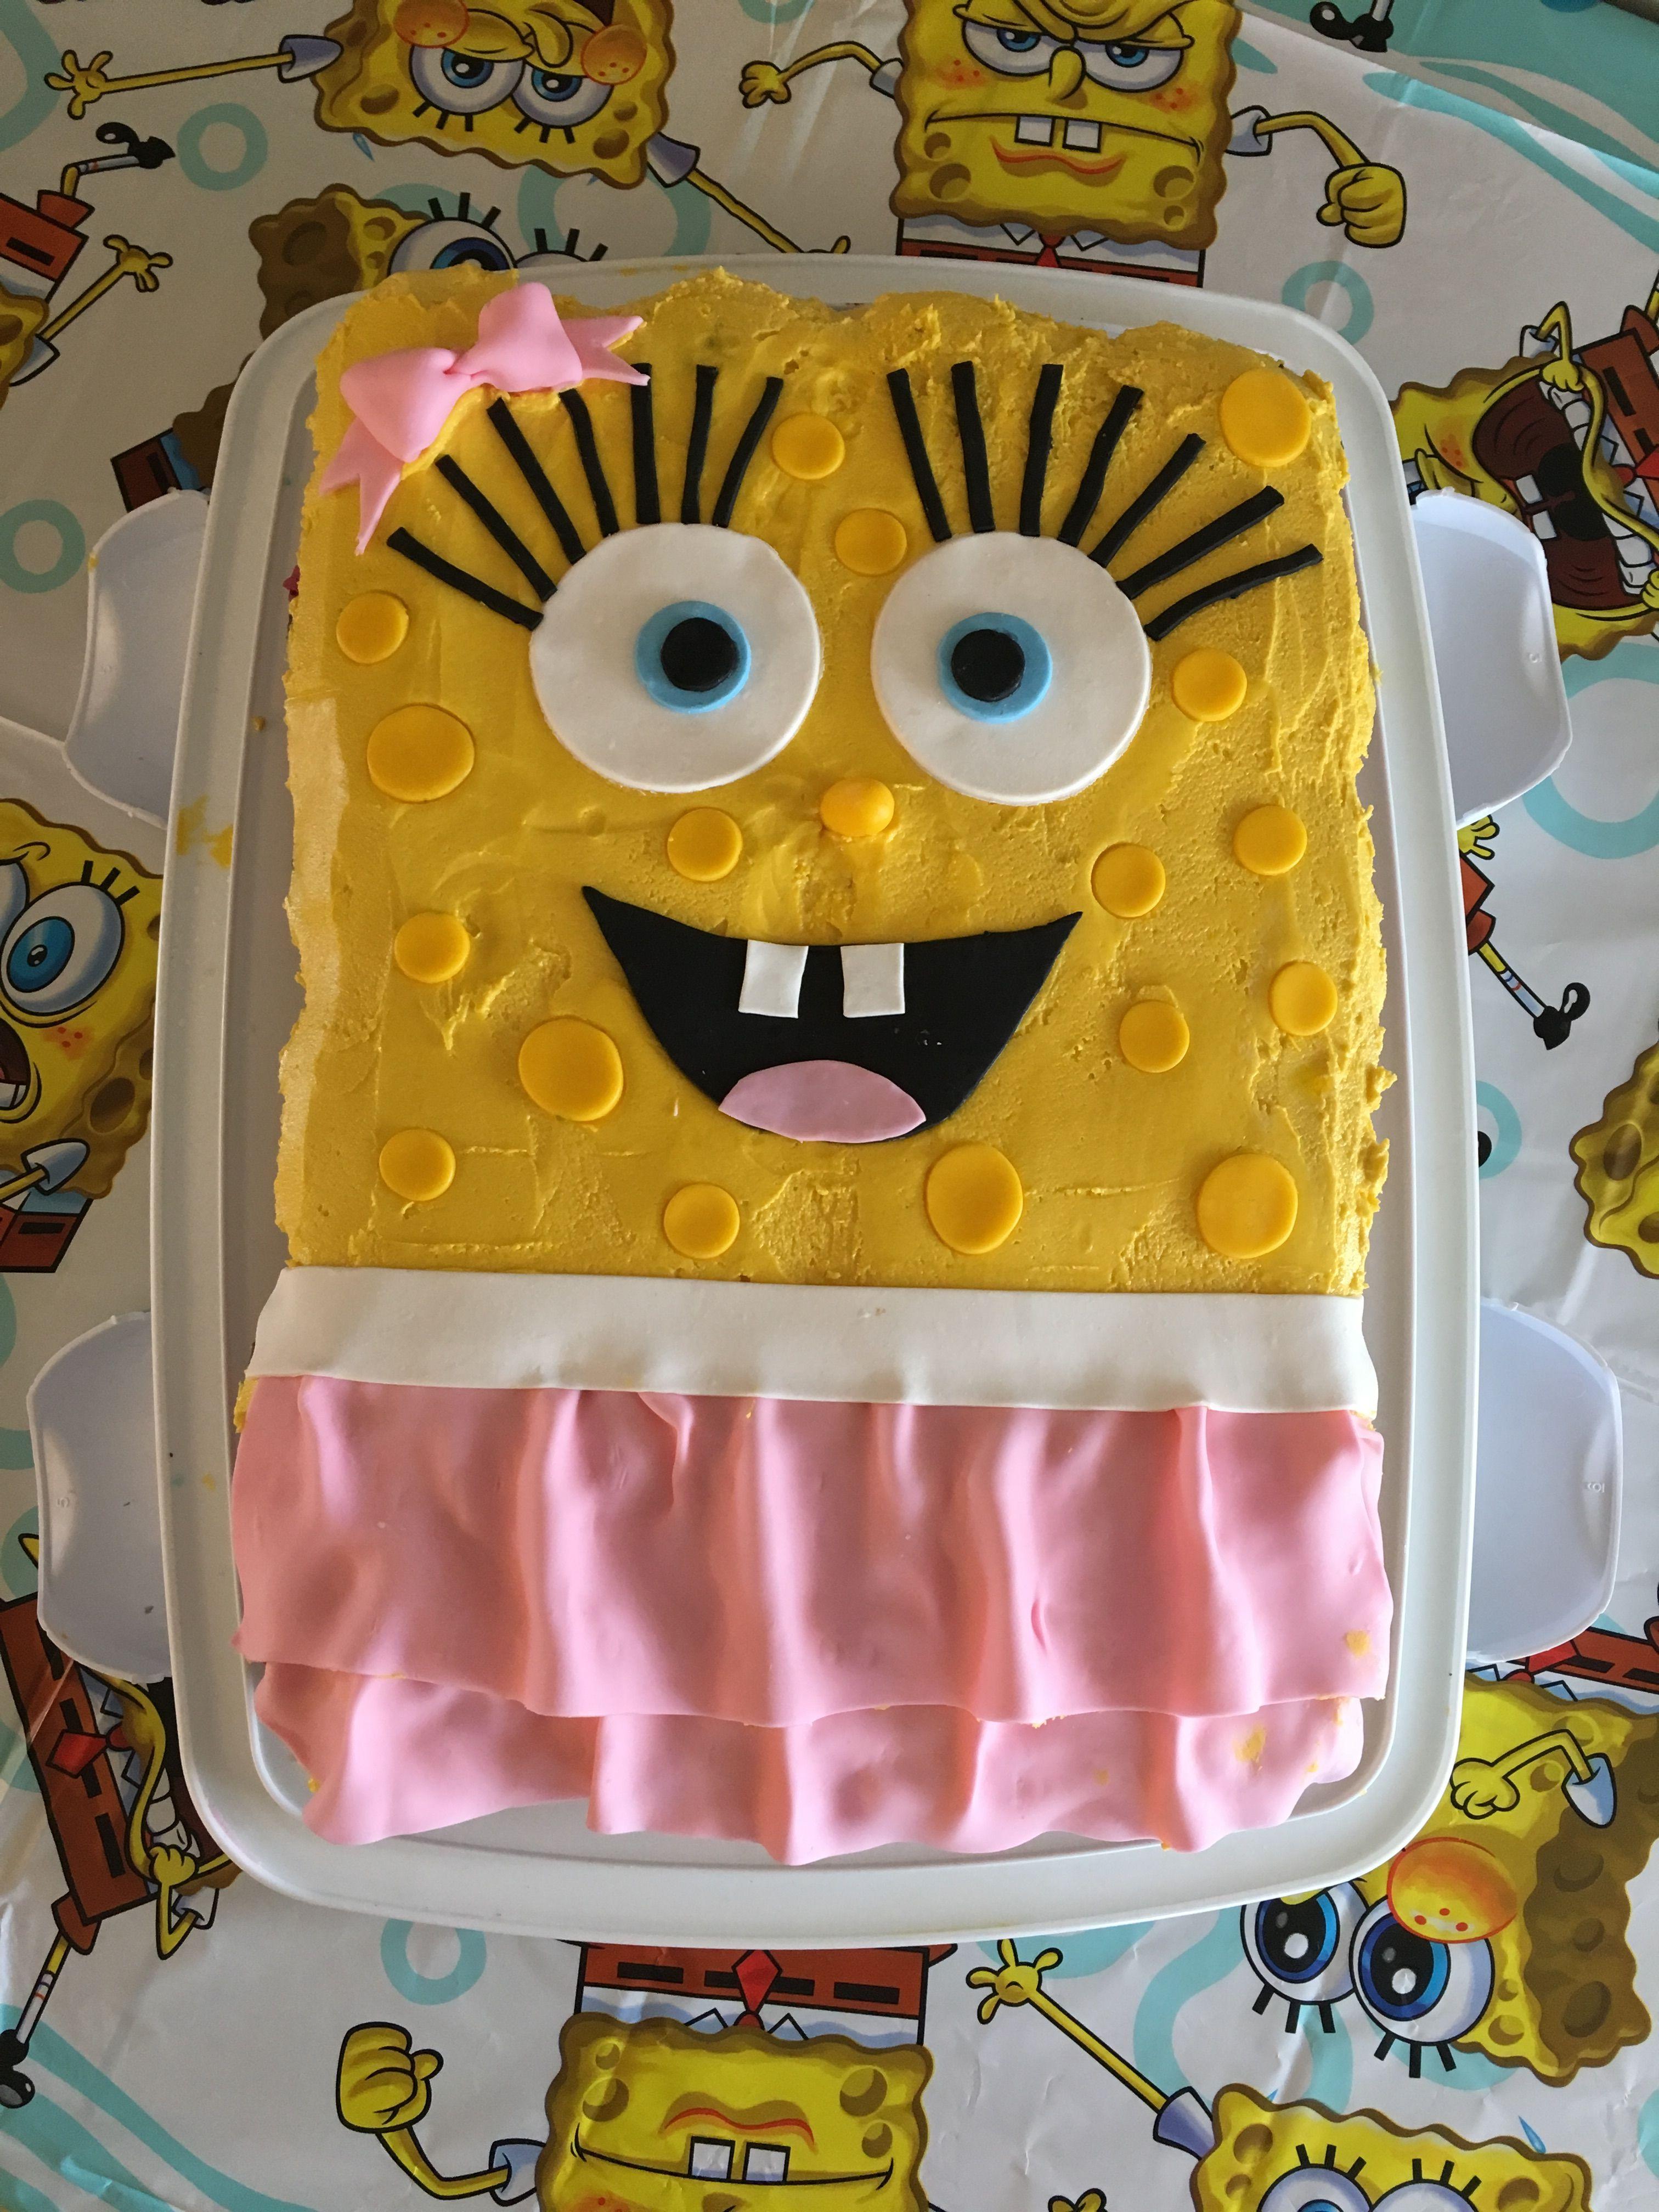 Girly spongebob cake spongebob cake lunch box spongebob